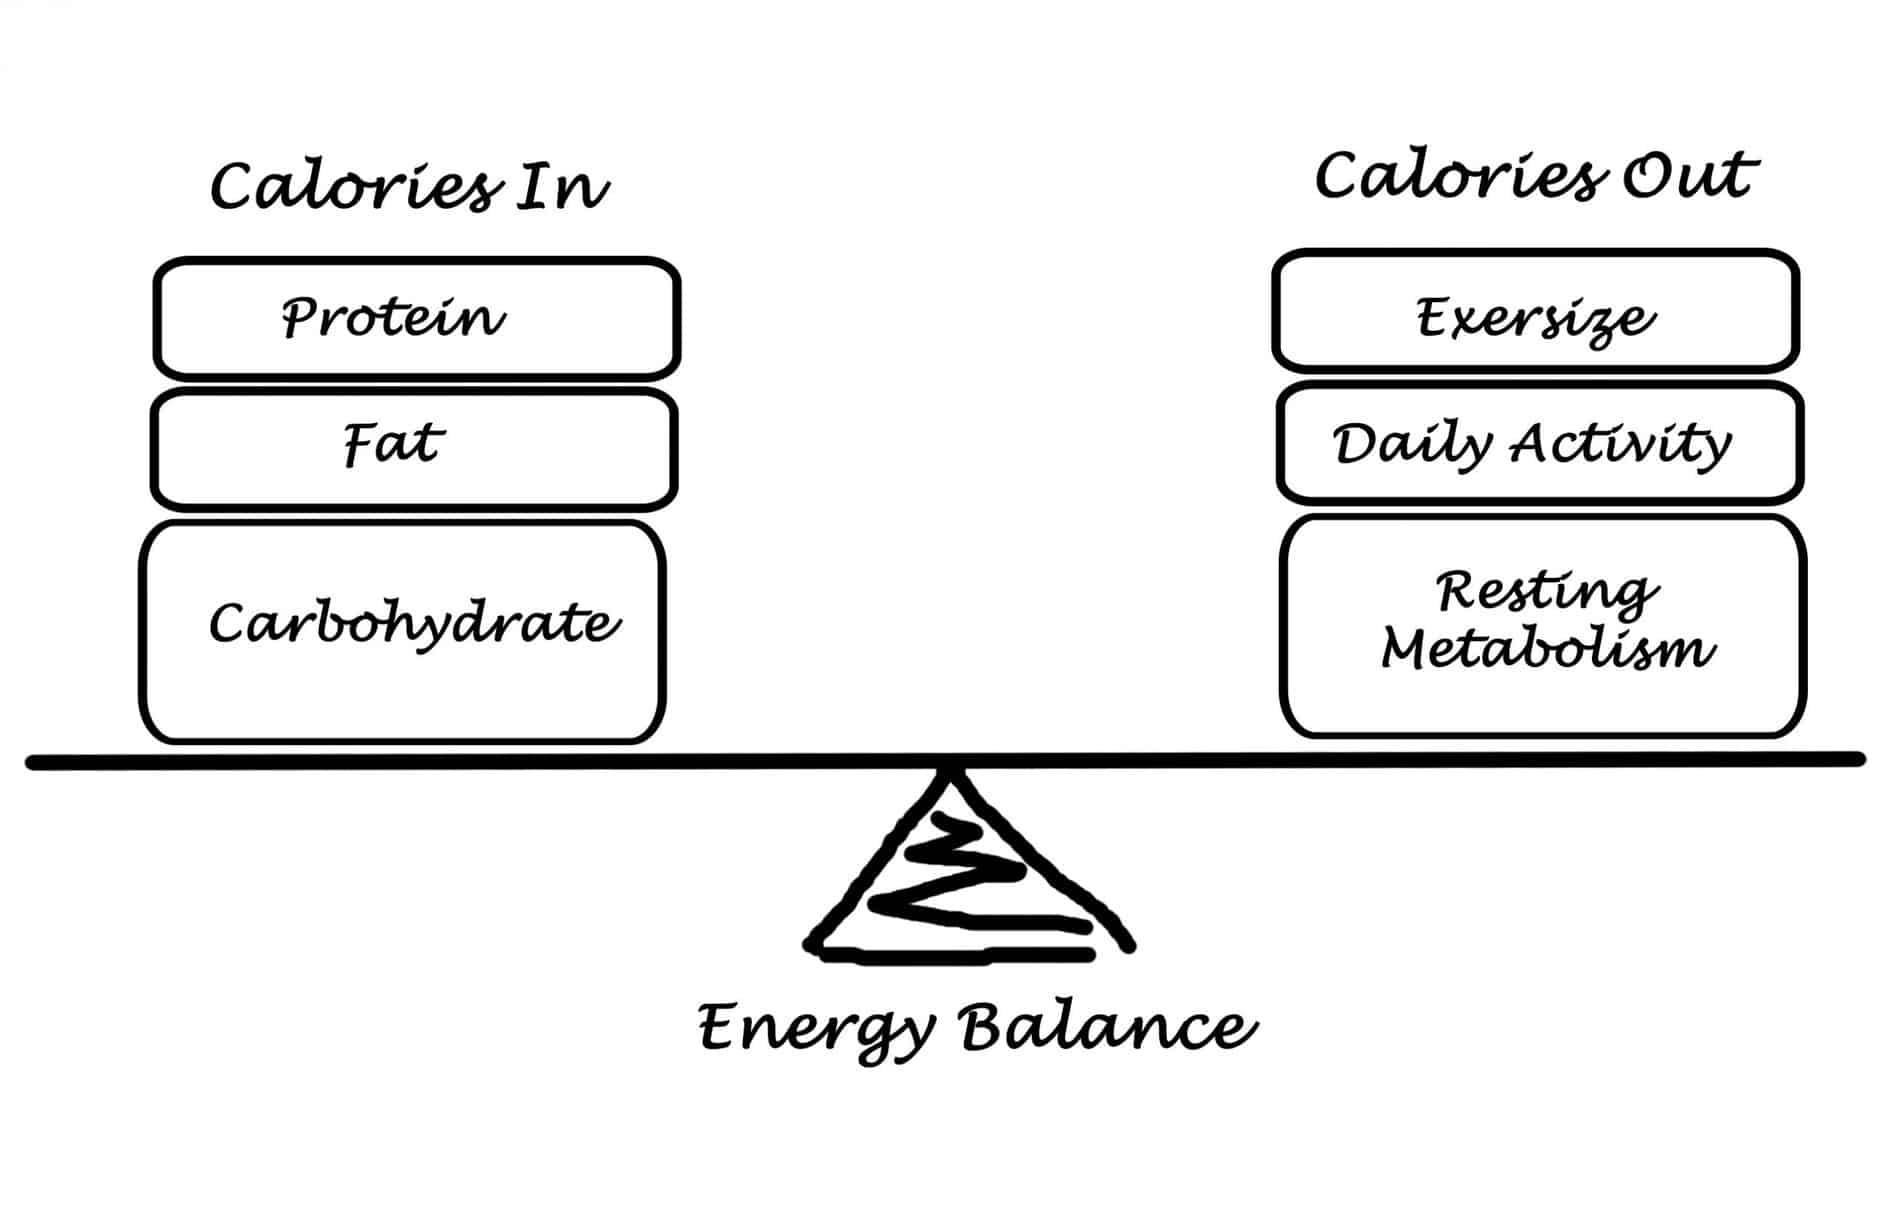 Maintenance Calorie Calculator Burn Fat Build Muscle